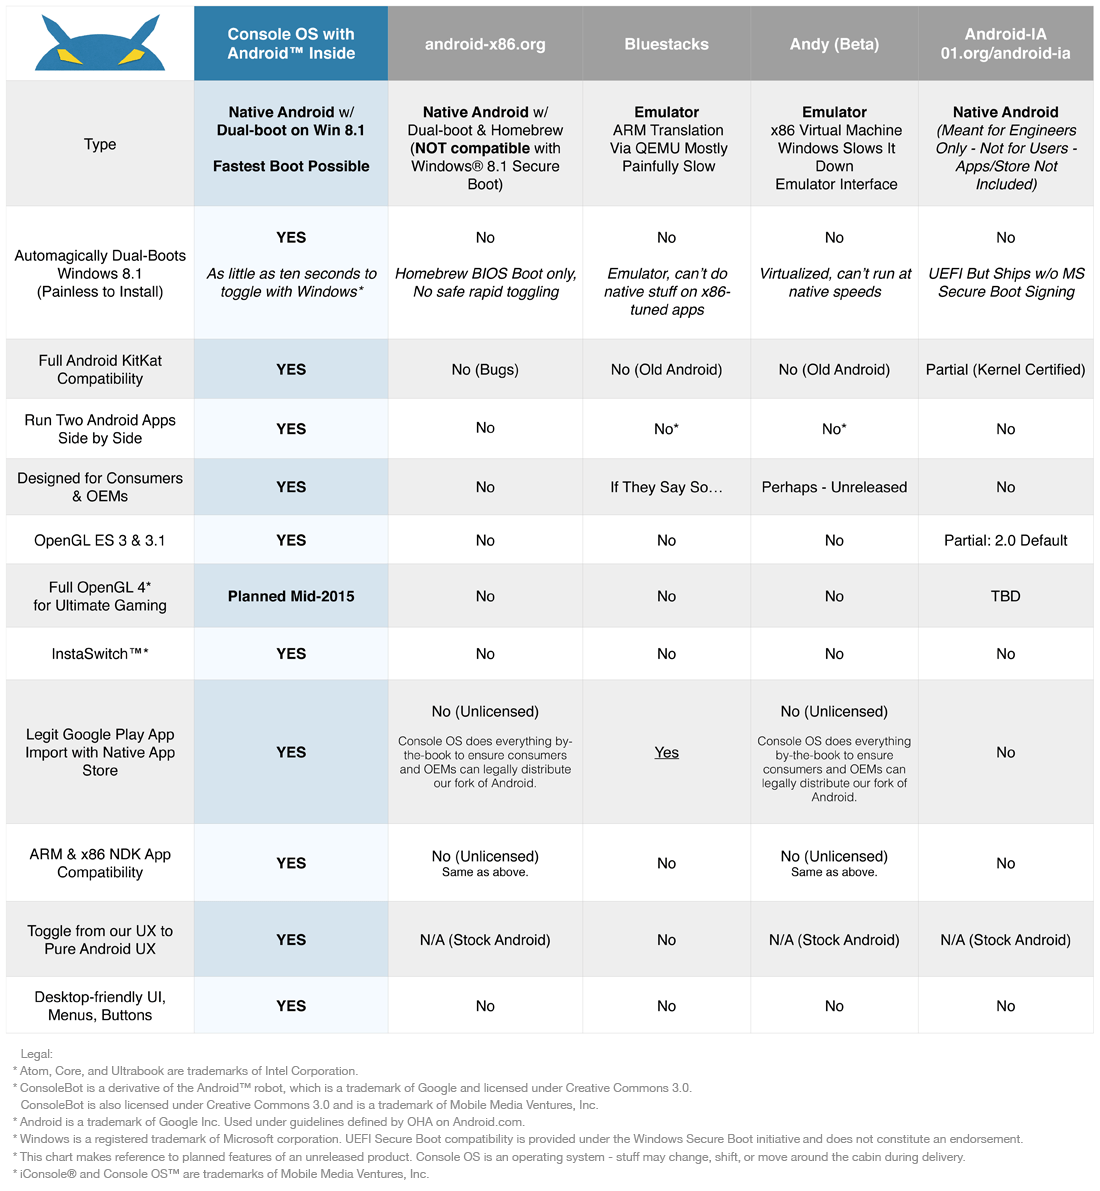 comparativa-console-OS